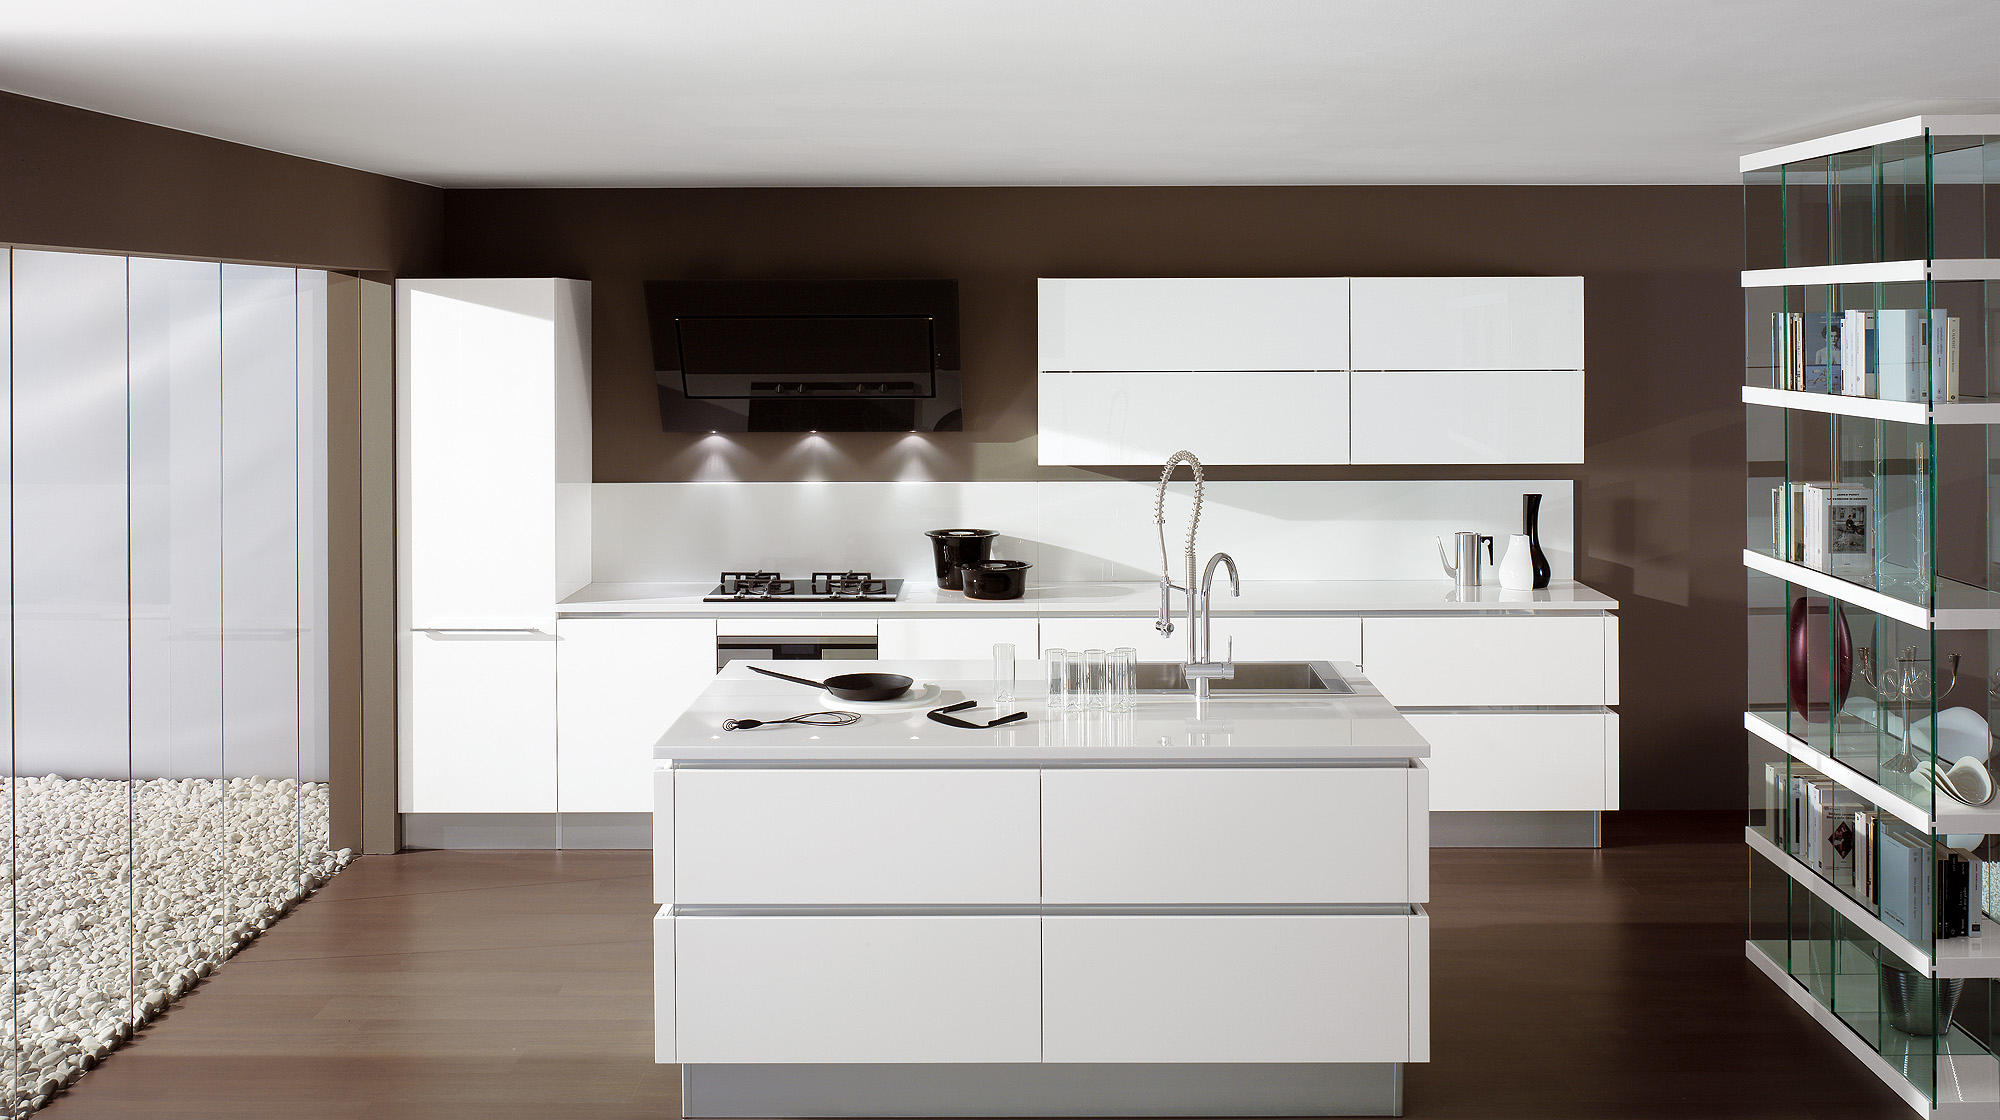 Cucina Oyster Pro Veneta Cucine | Soggiorno Veneta Cucine 2 Top ...